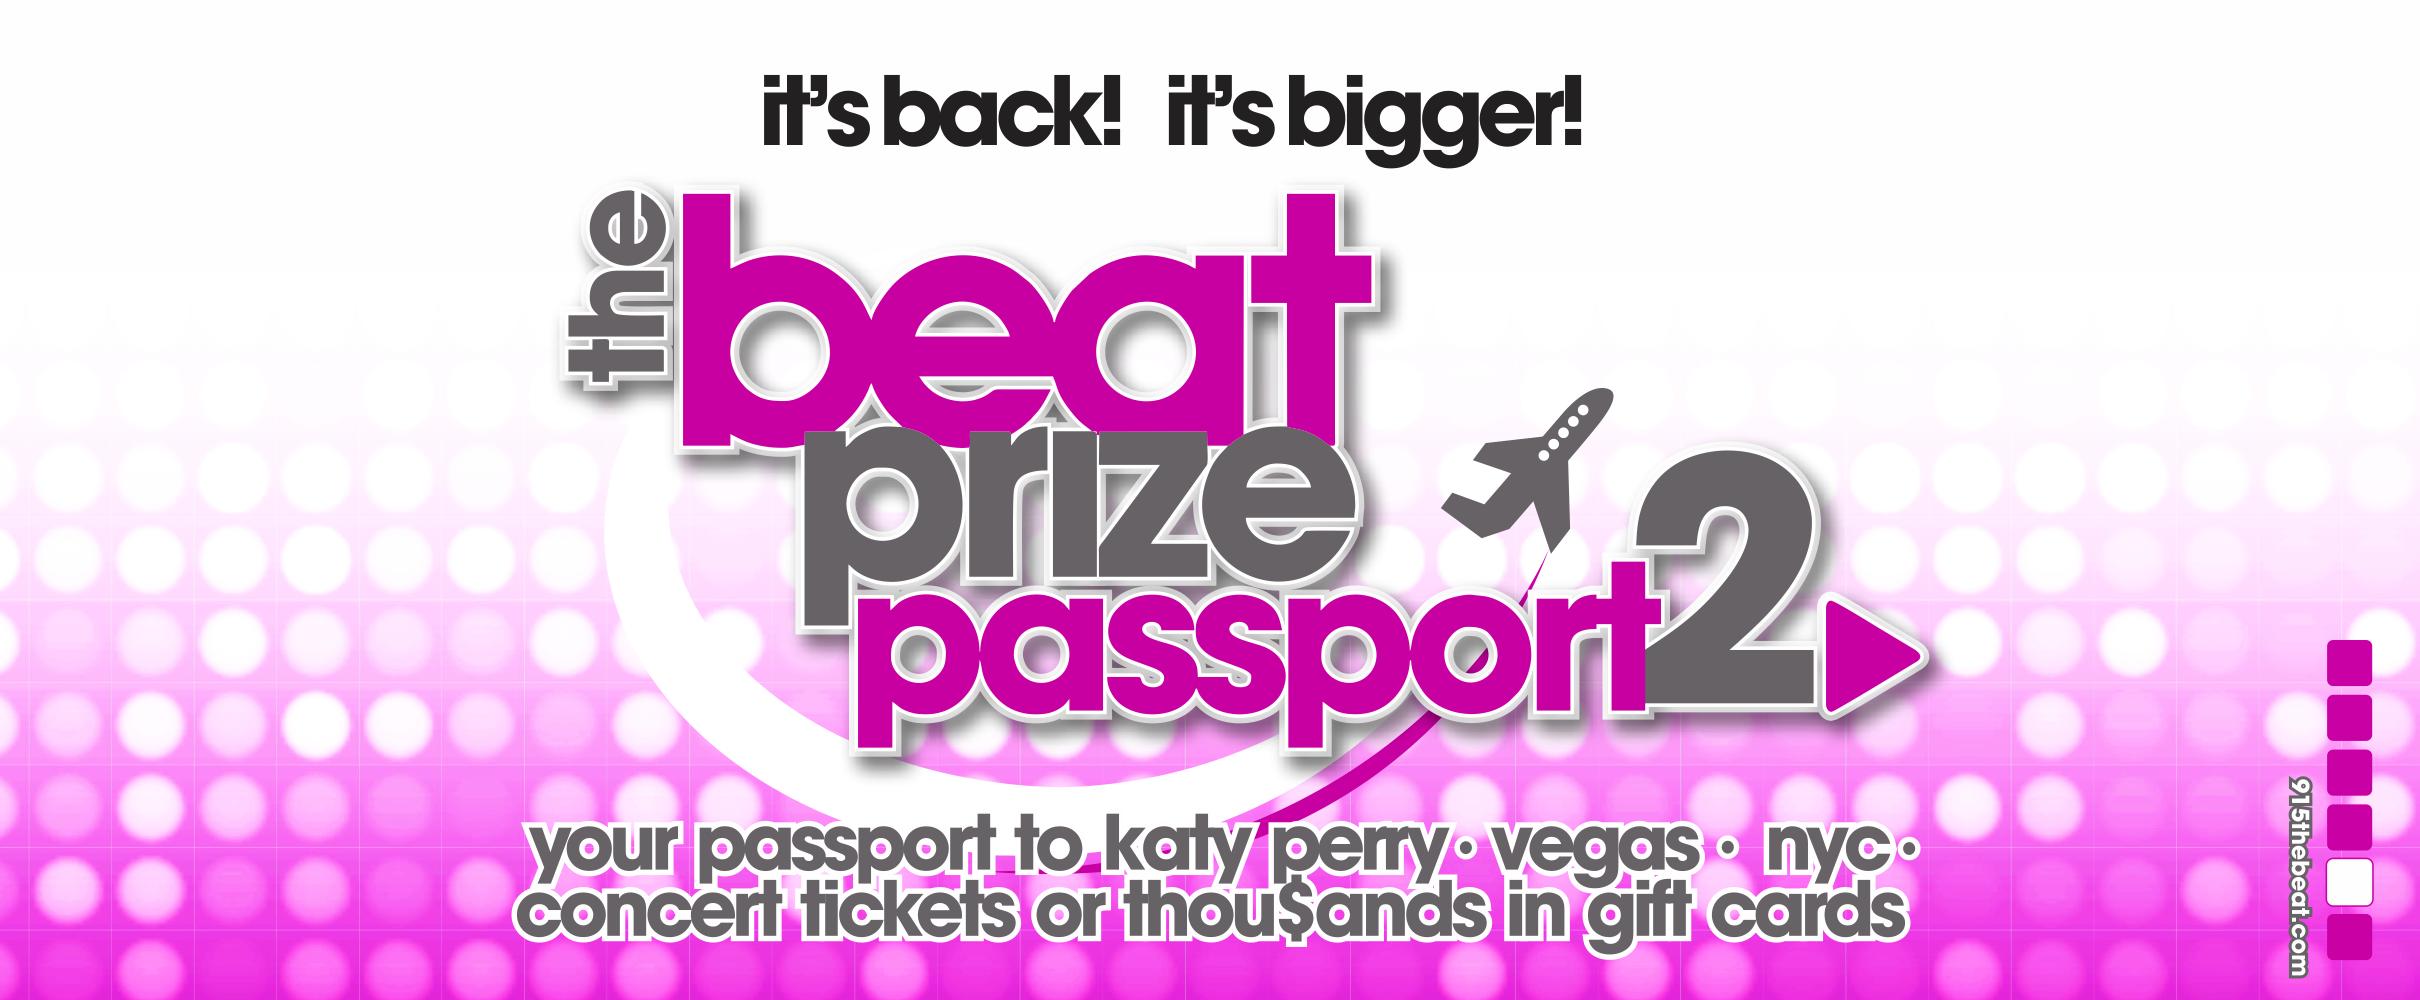 The Beat Prize Passport 2!